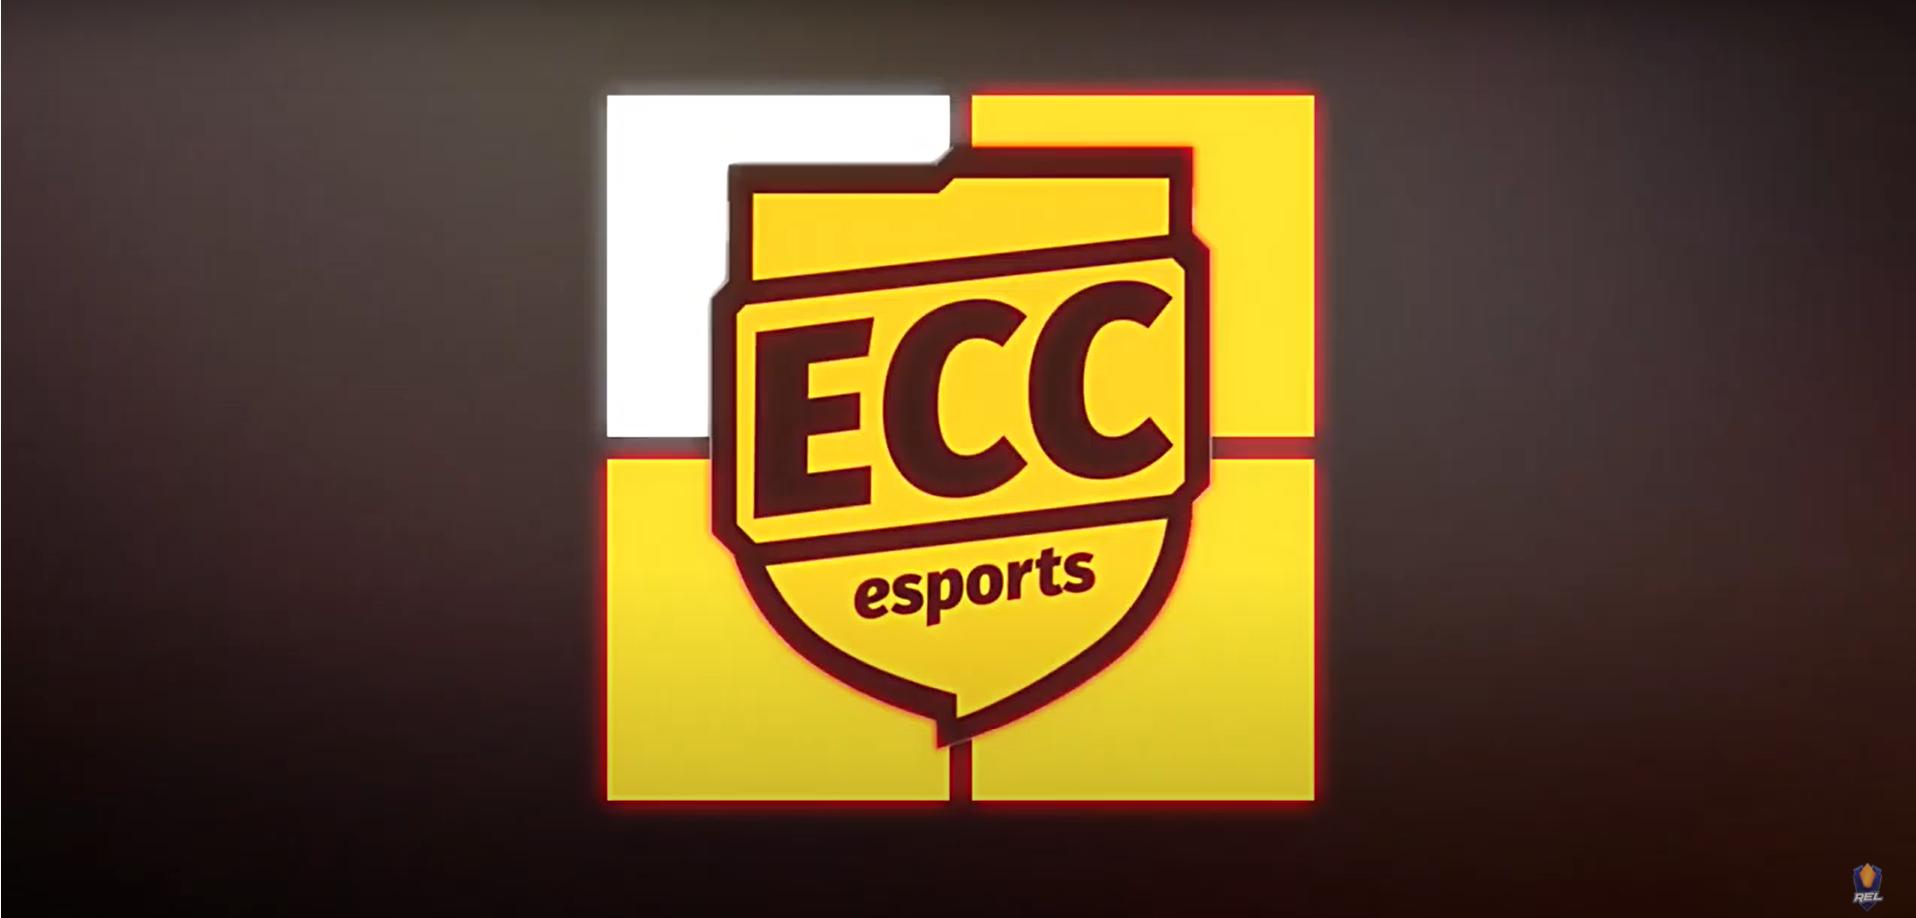 Esports Corporate Championship